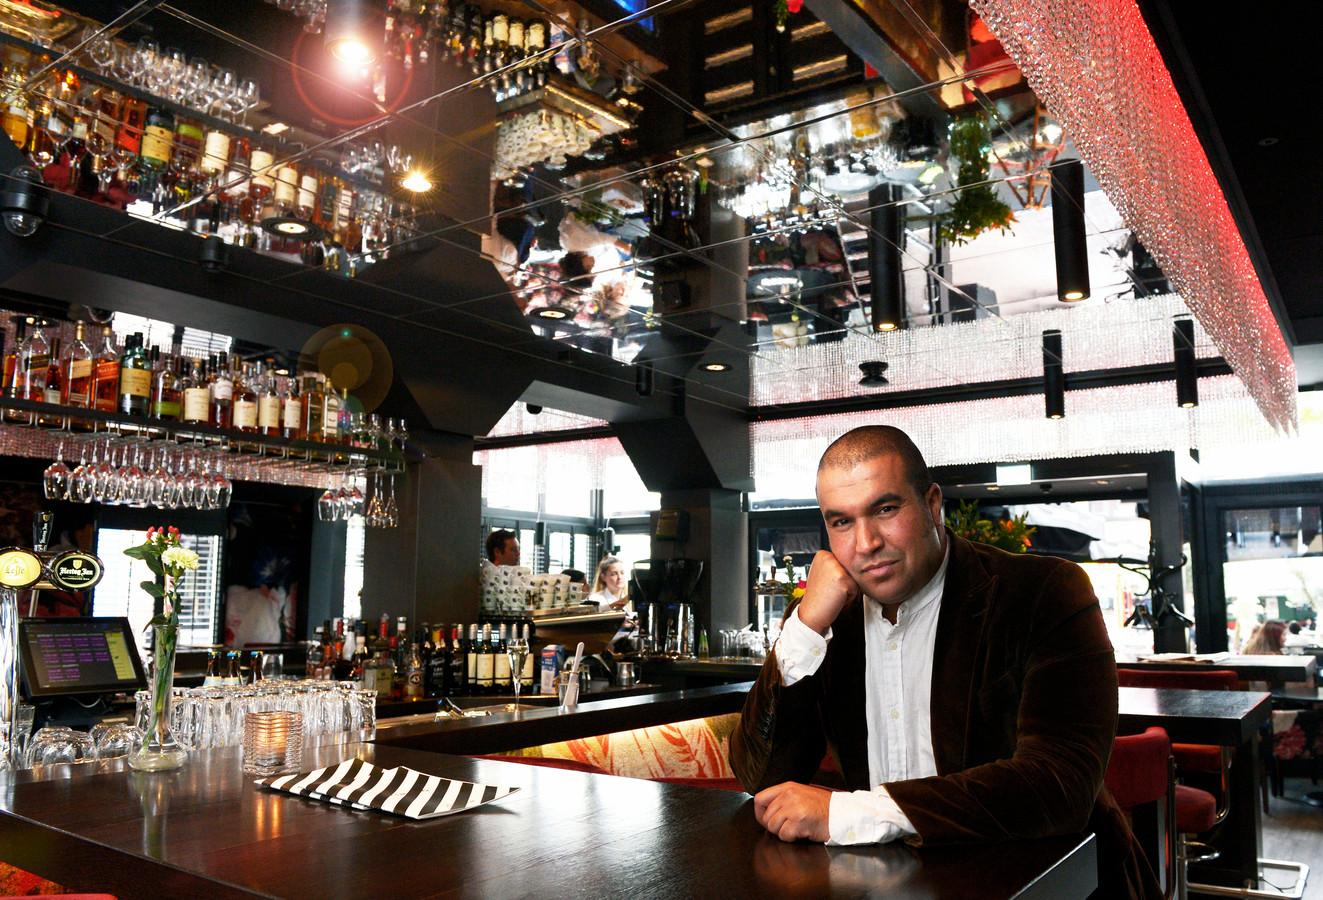 Khalid Oubaha in Café Arnhem.